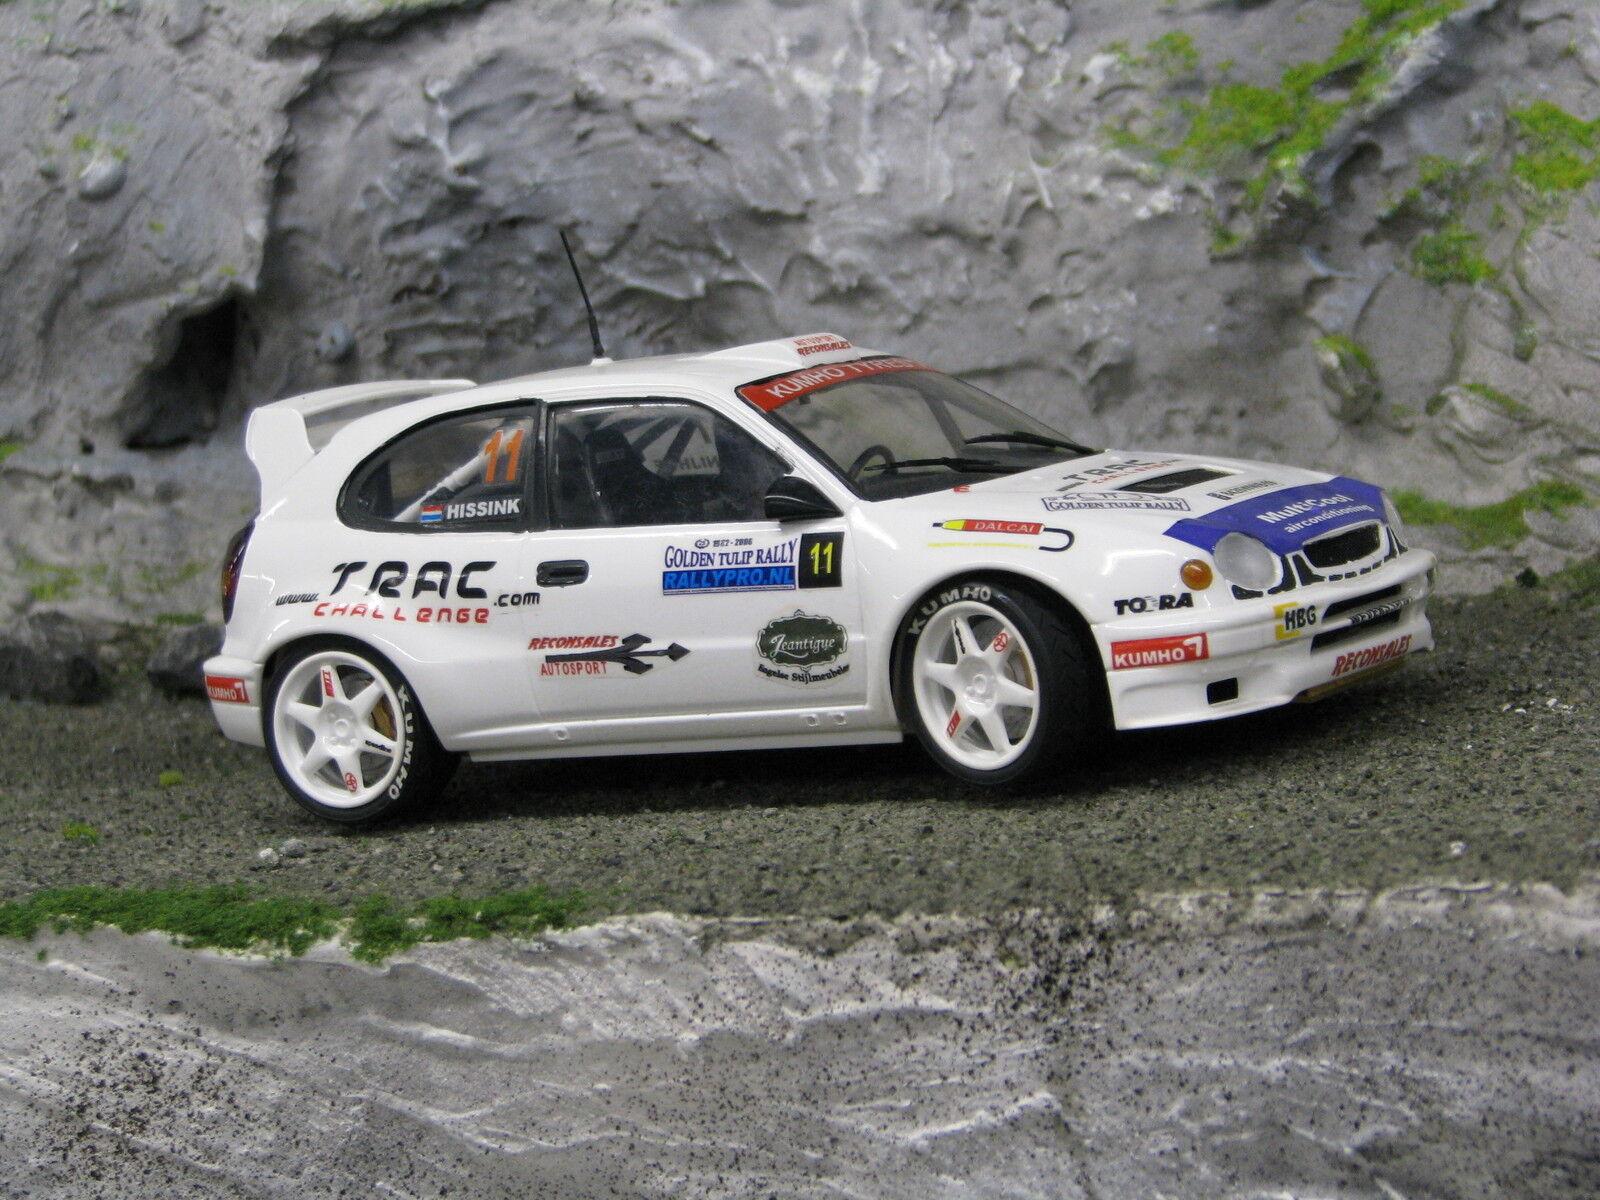 QSP Toyota Cgoldlla WRC 1 24 Nijhof   Hissink golden Tulip Rally 2006